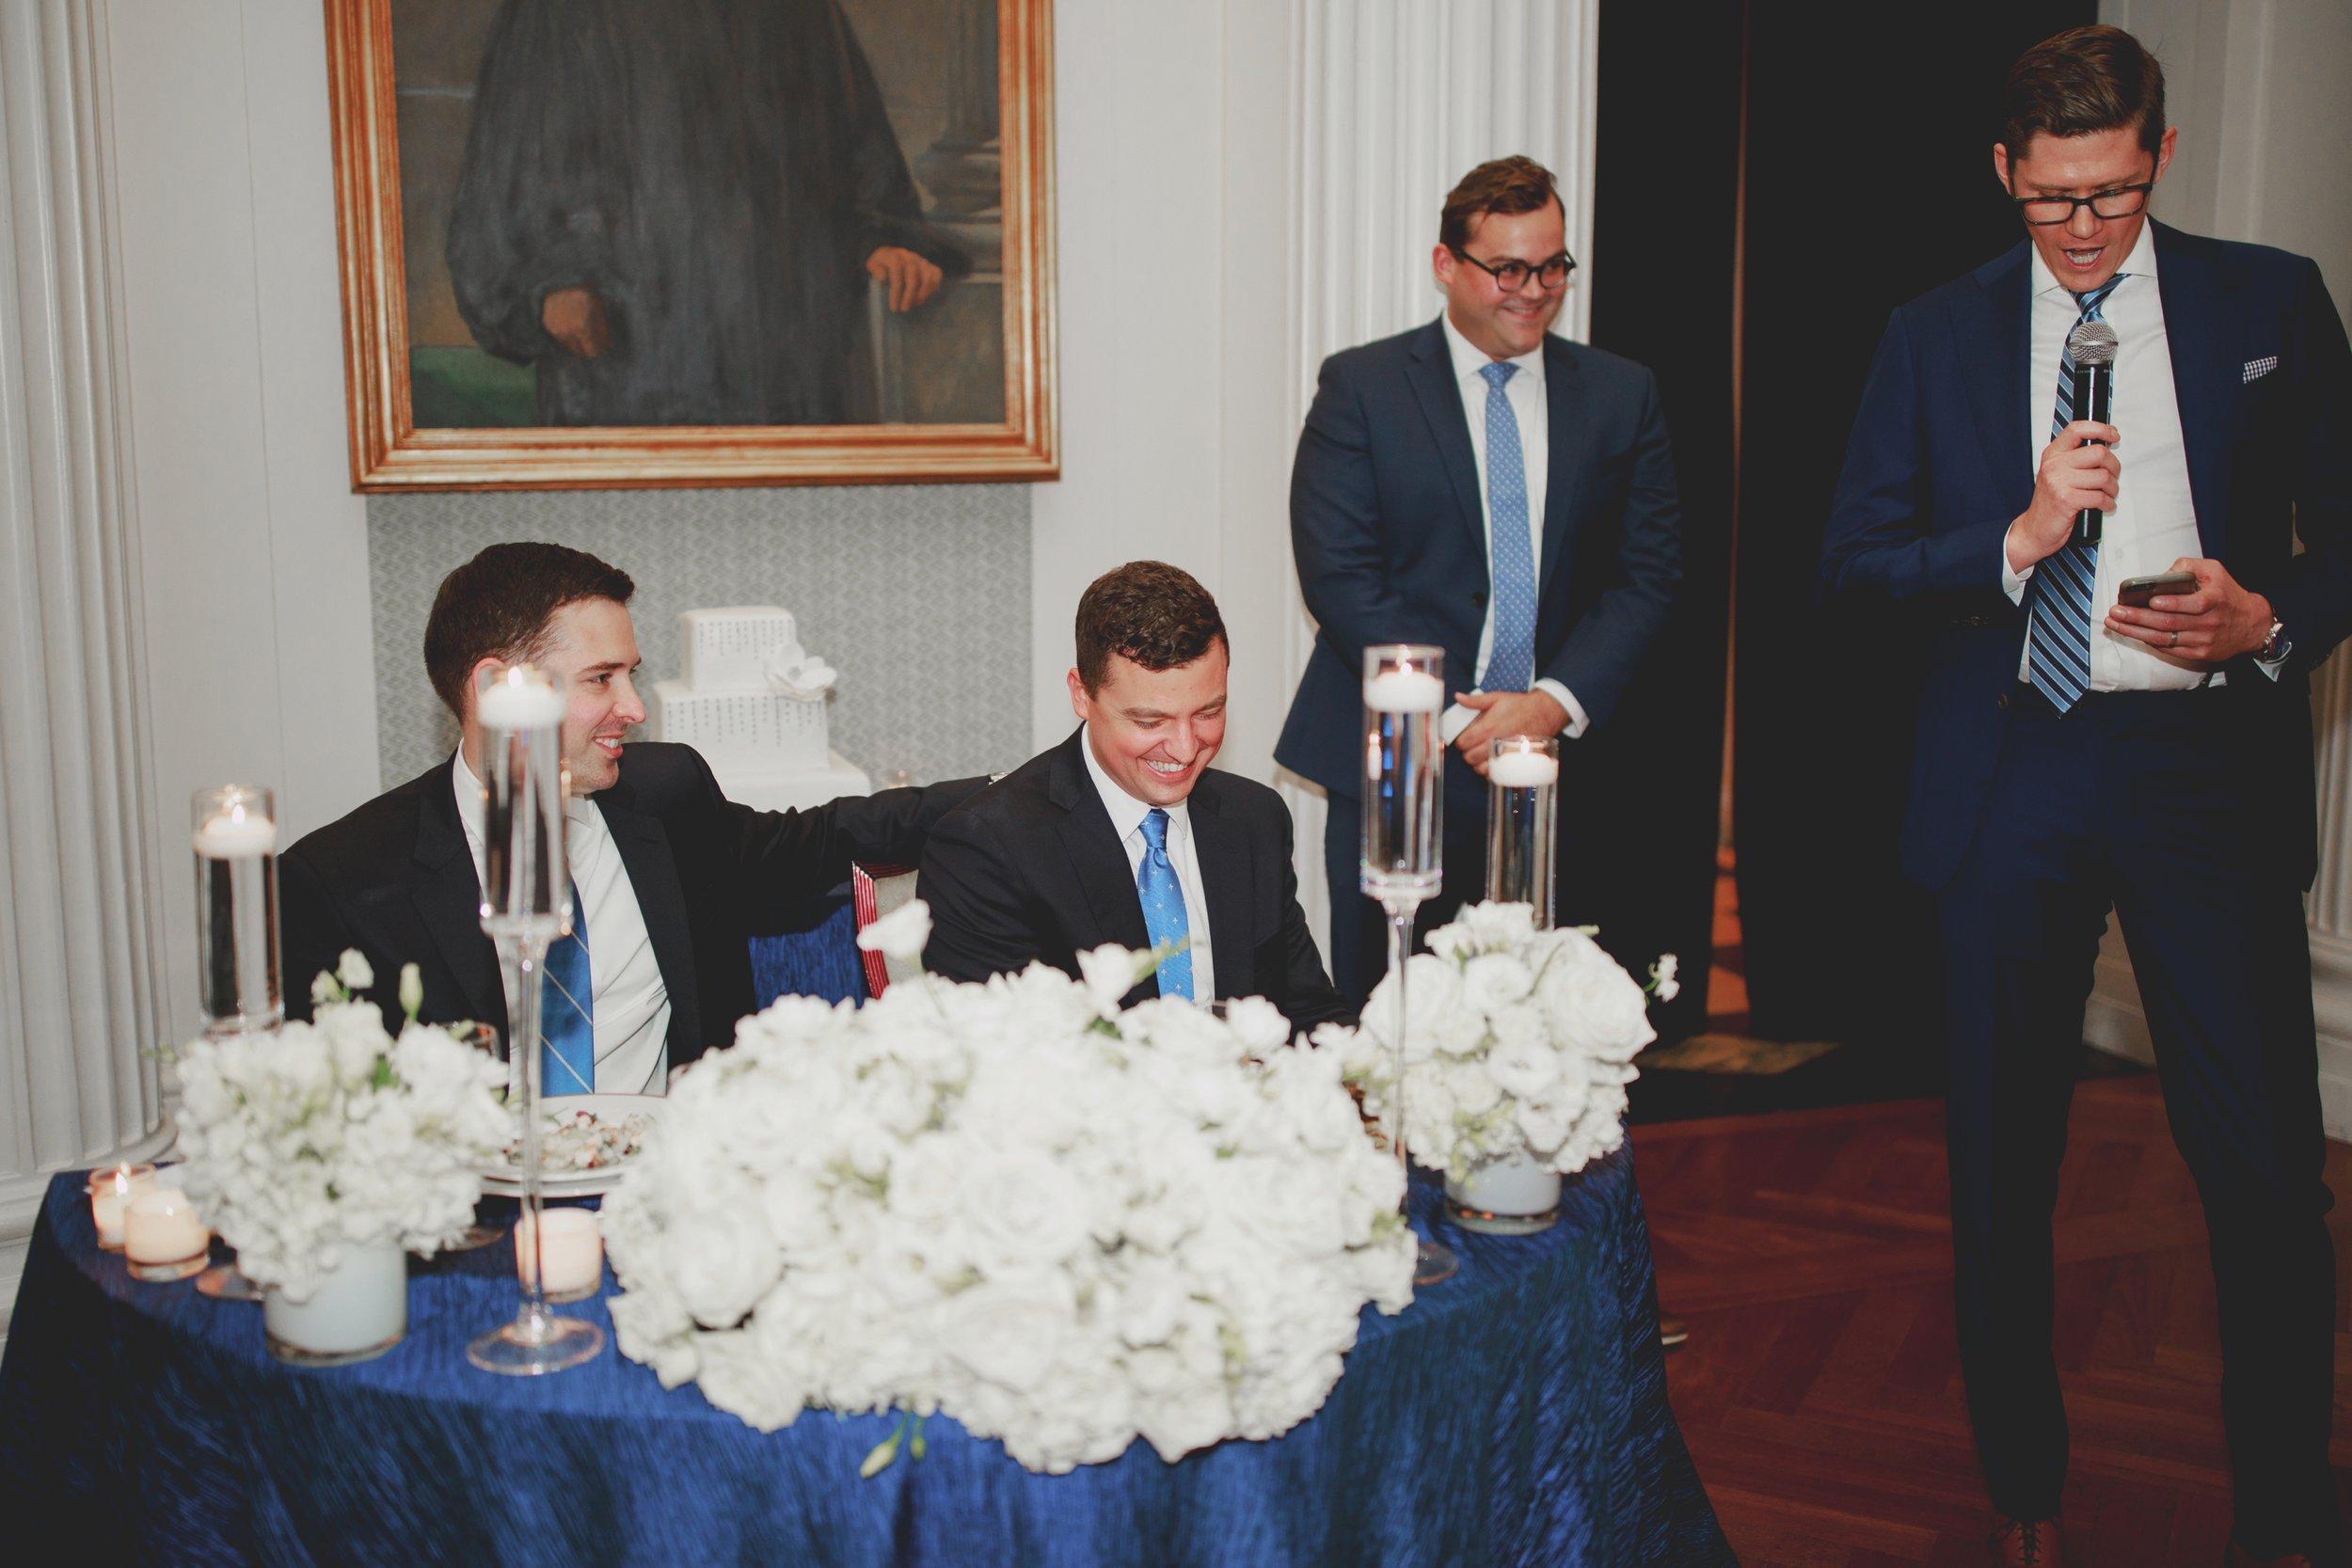 amanda_vanvels_new_york_lgbtq_gay_wedding_096.jpg